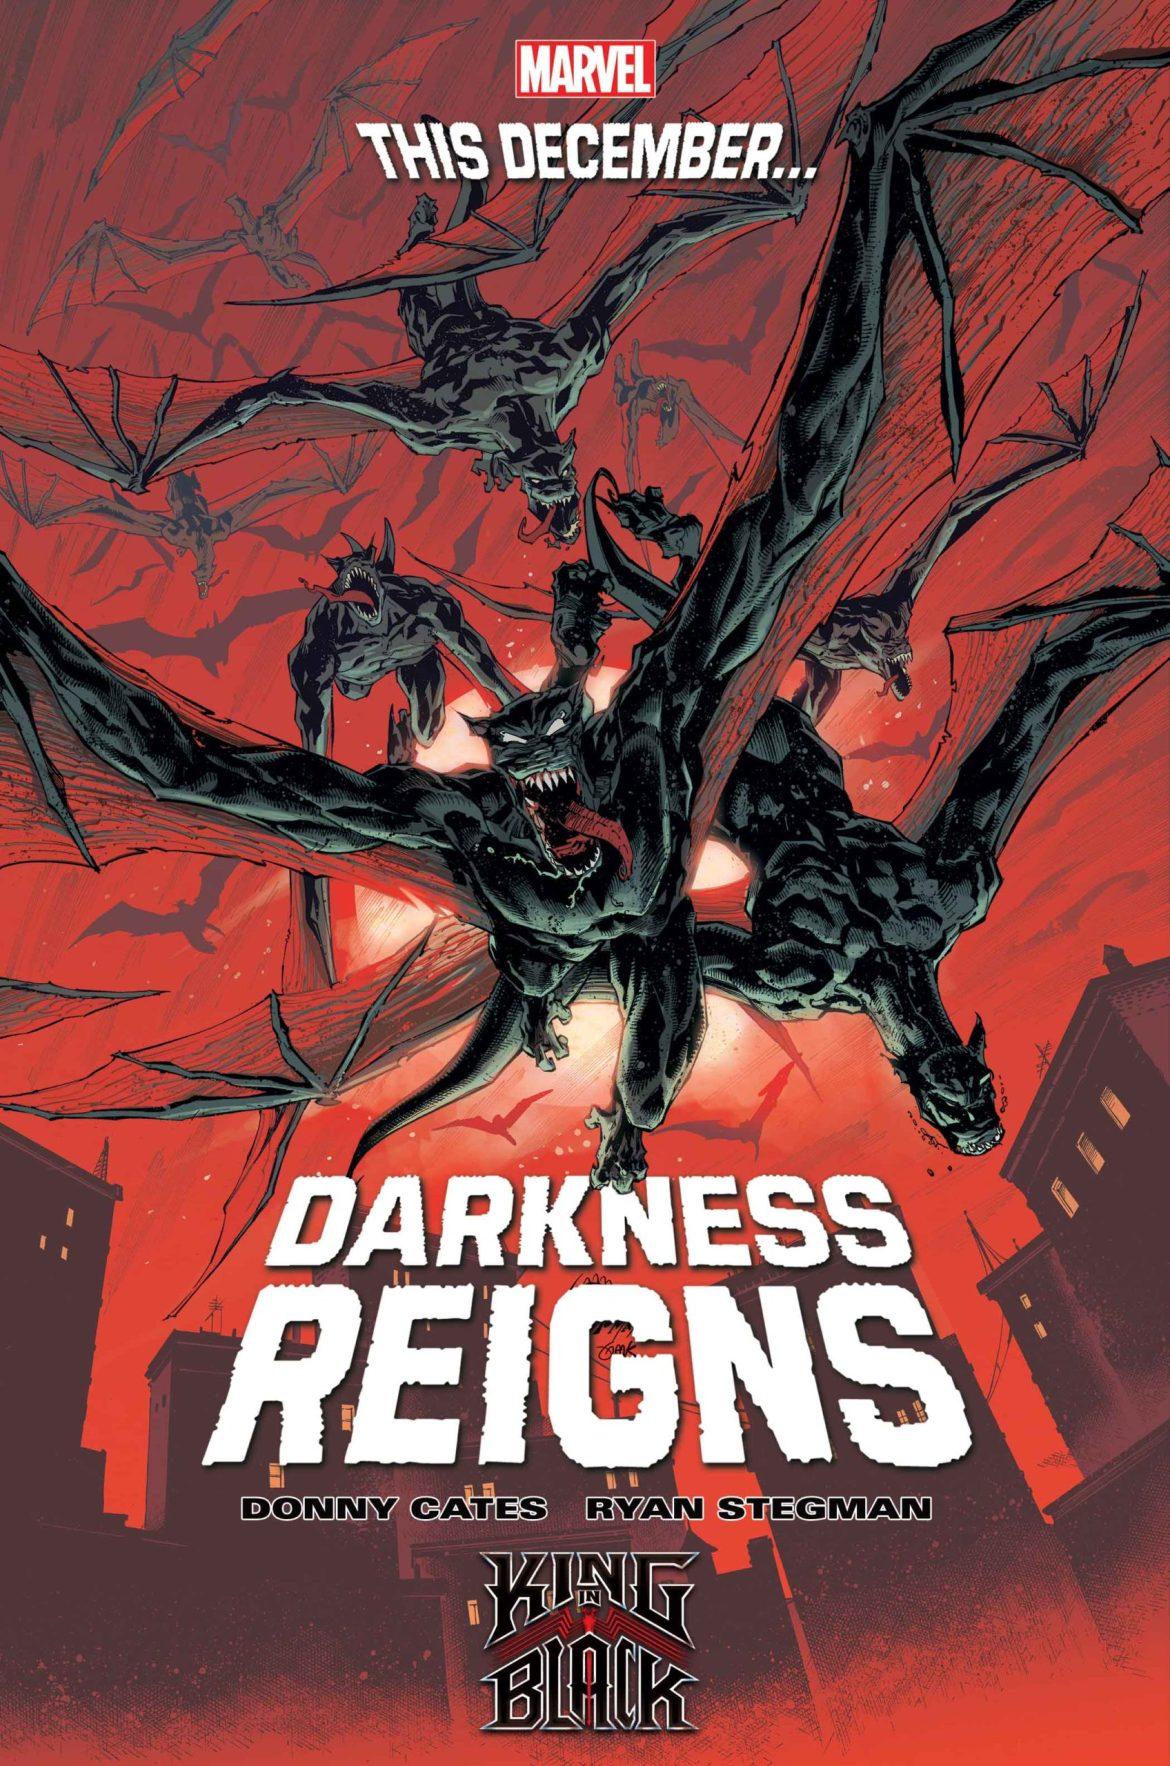 KIB_TEASER_8_2020-scaled Knull battles Venom and the Marvel Universe in KING IN BLACK